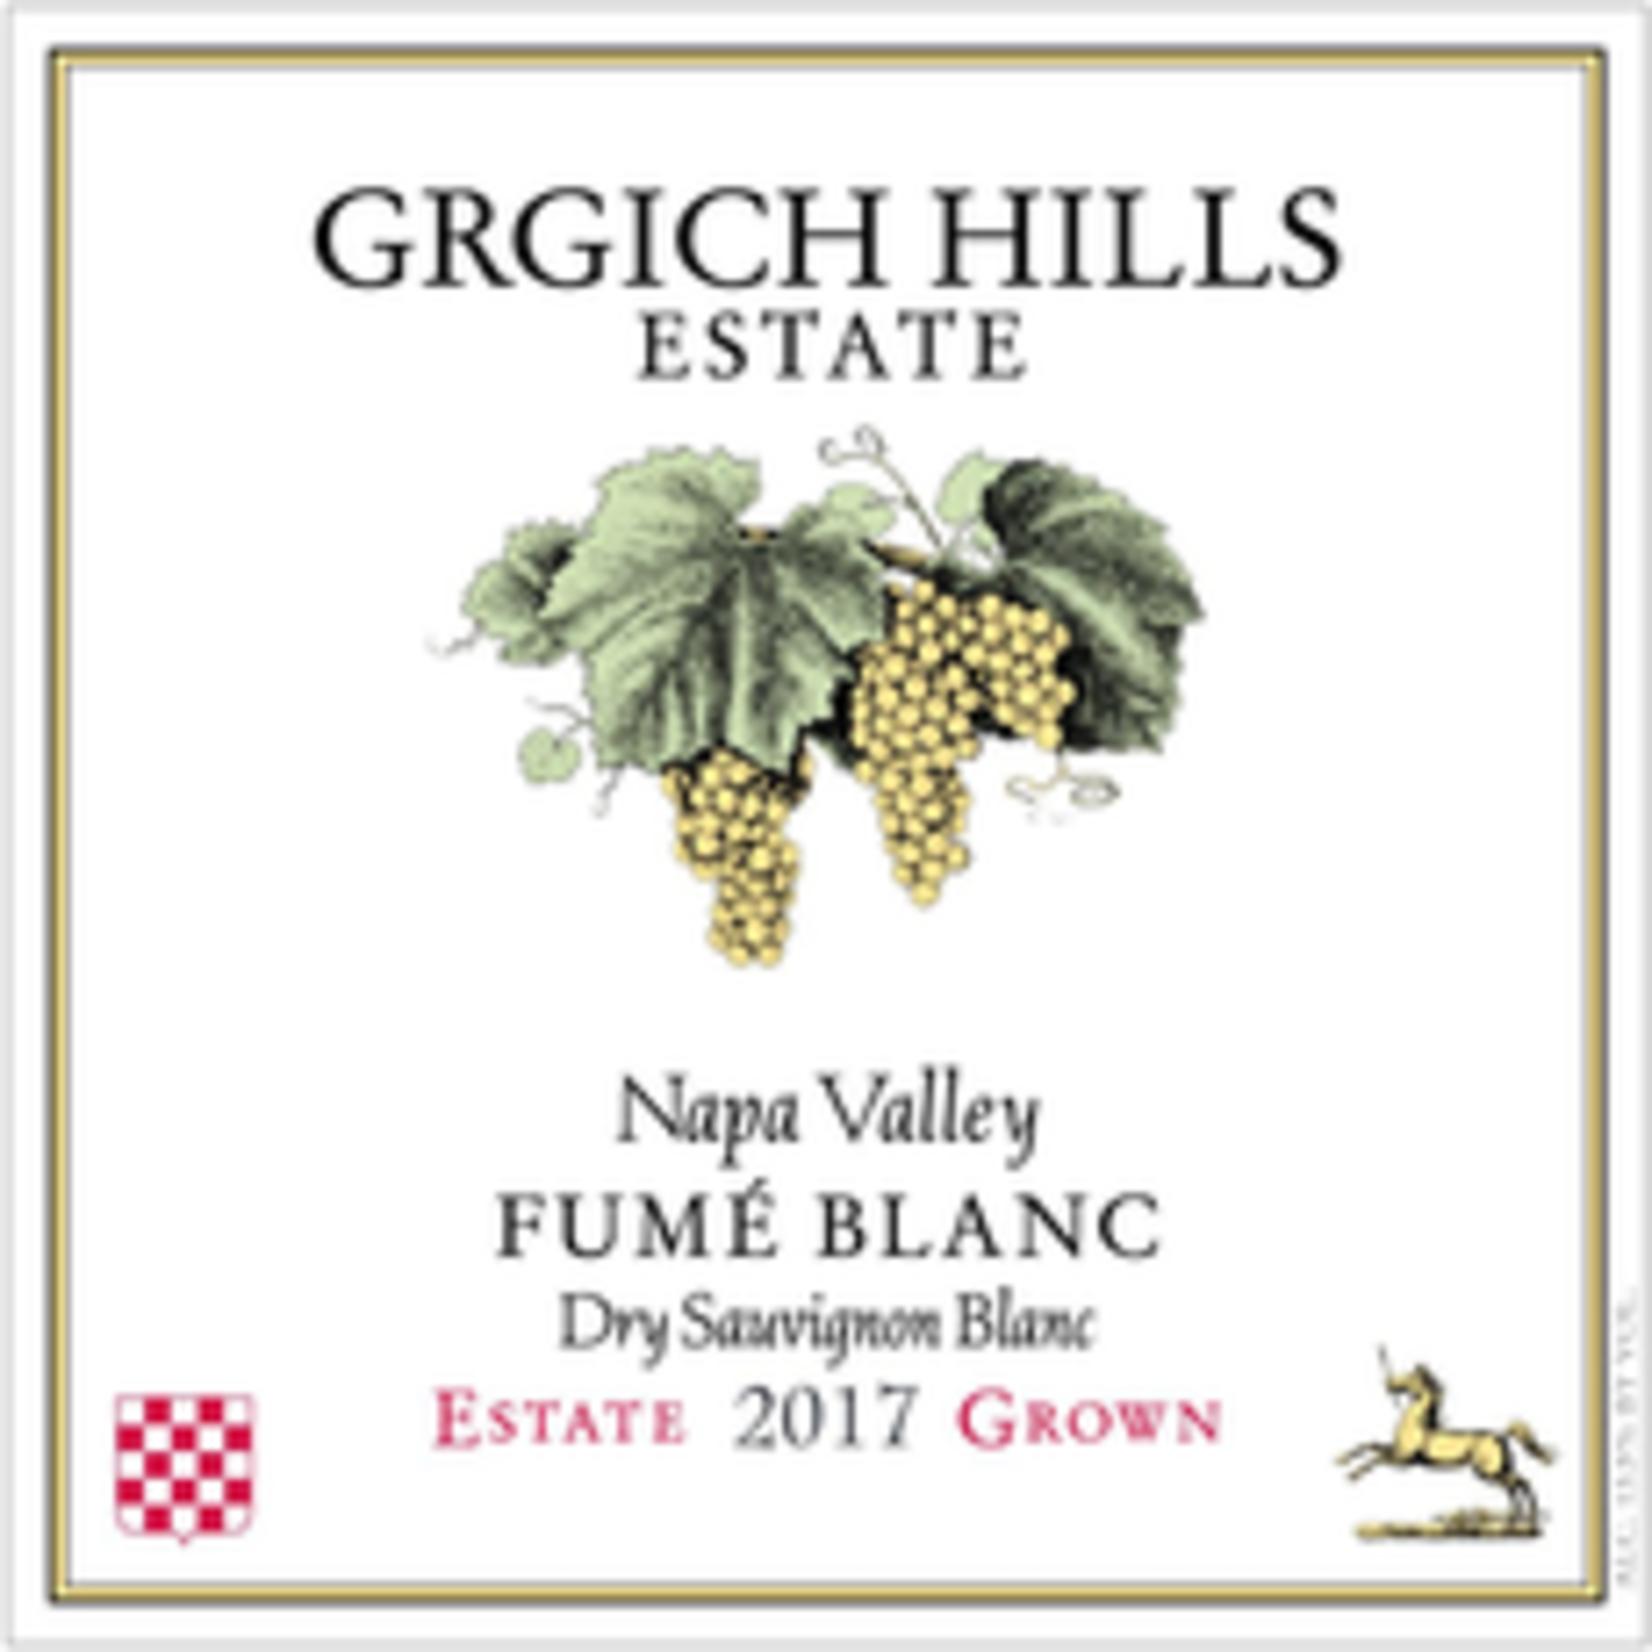 Wine Grgich Hills Estate Fume Blanc Estate Grown Dry Sauvignon Blanc Napa Valley